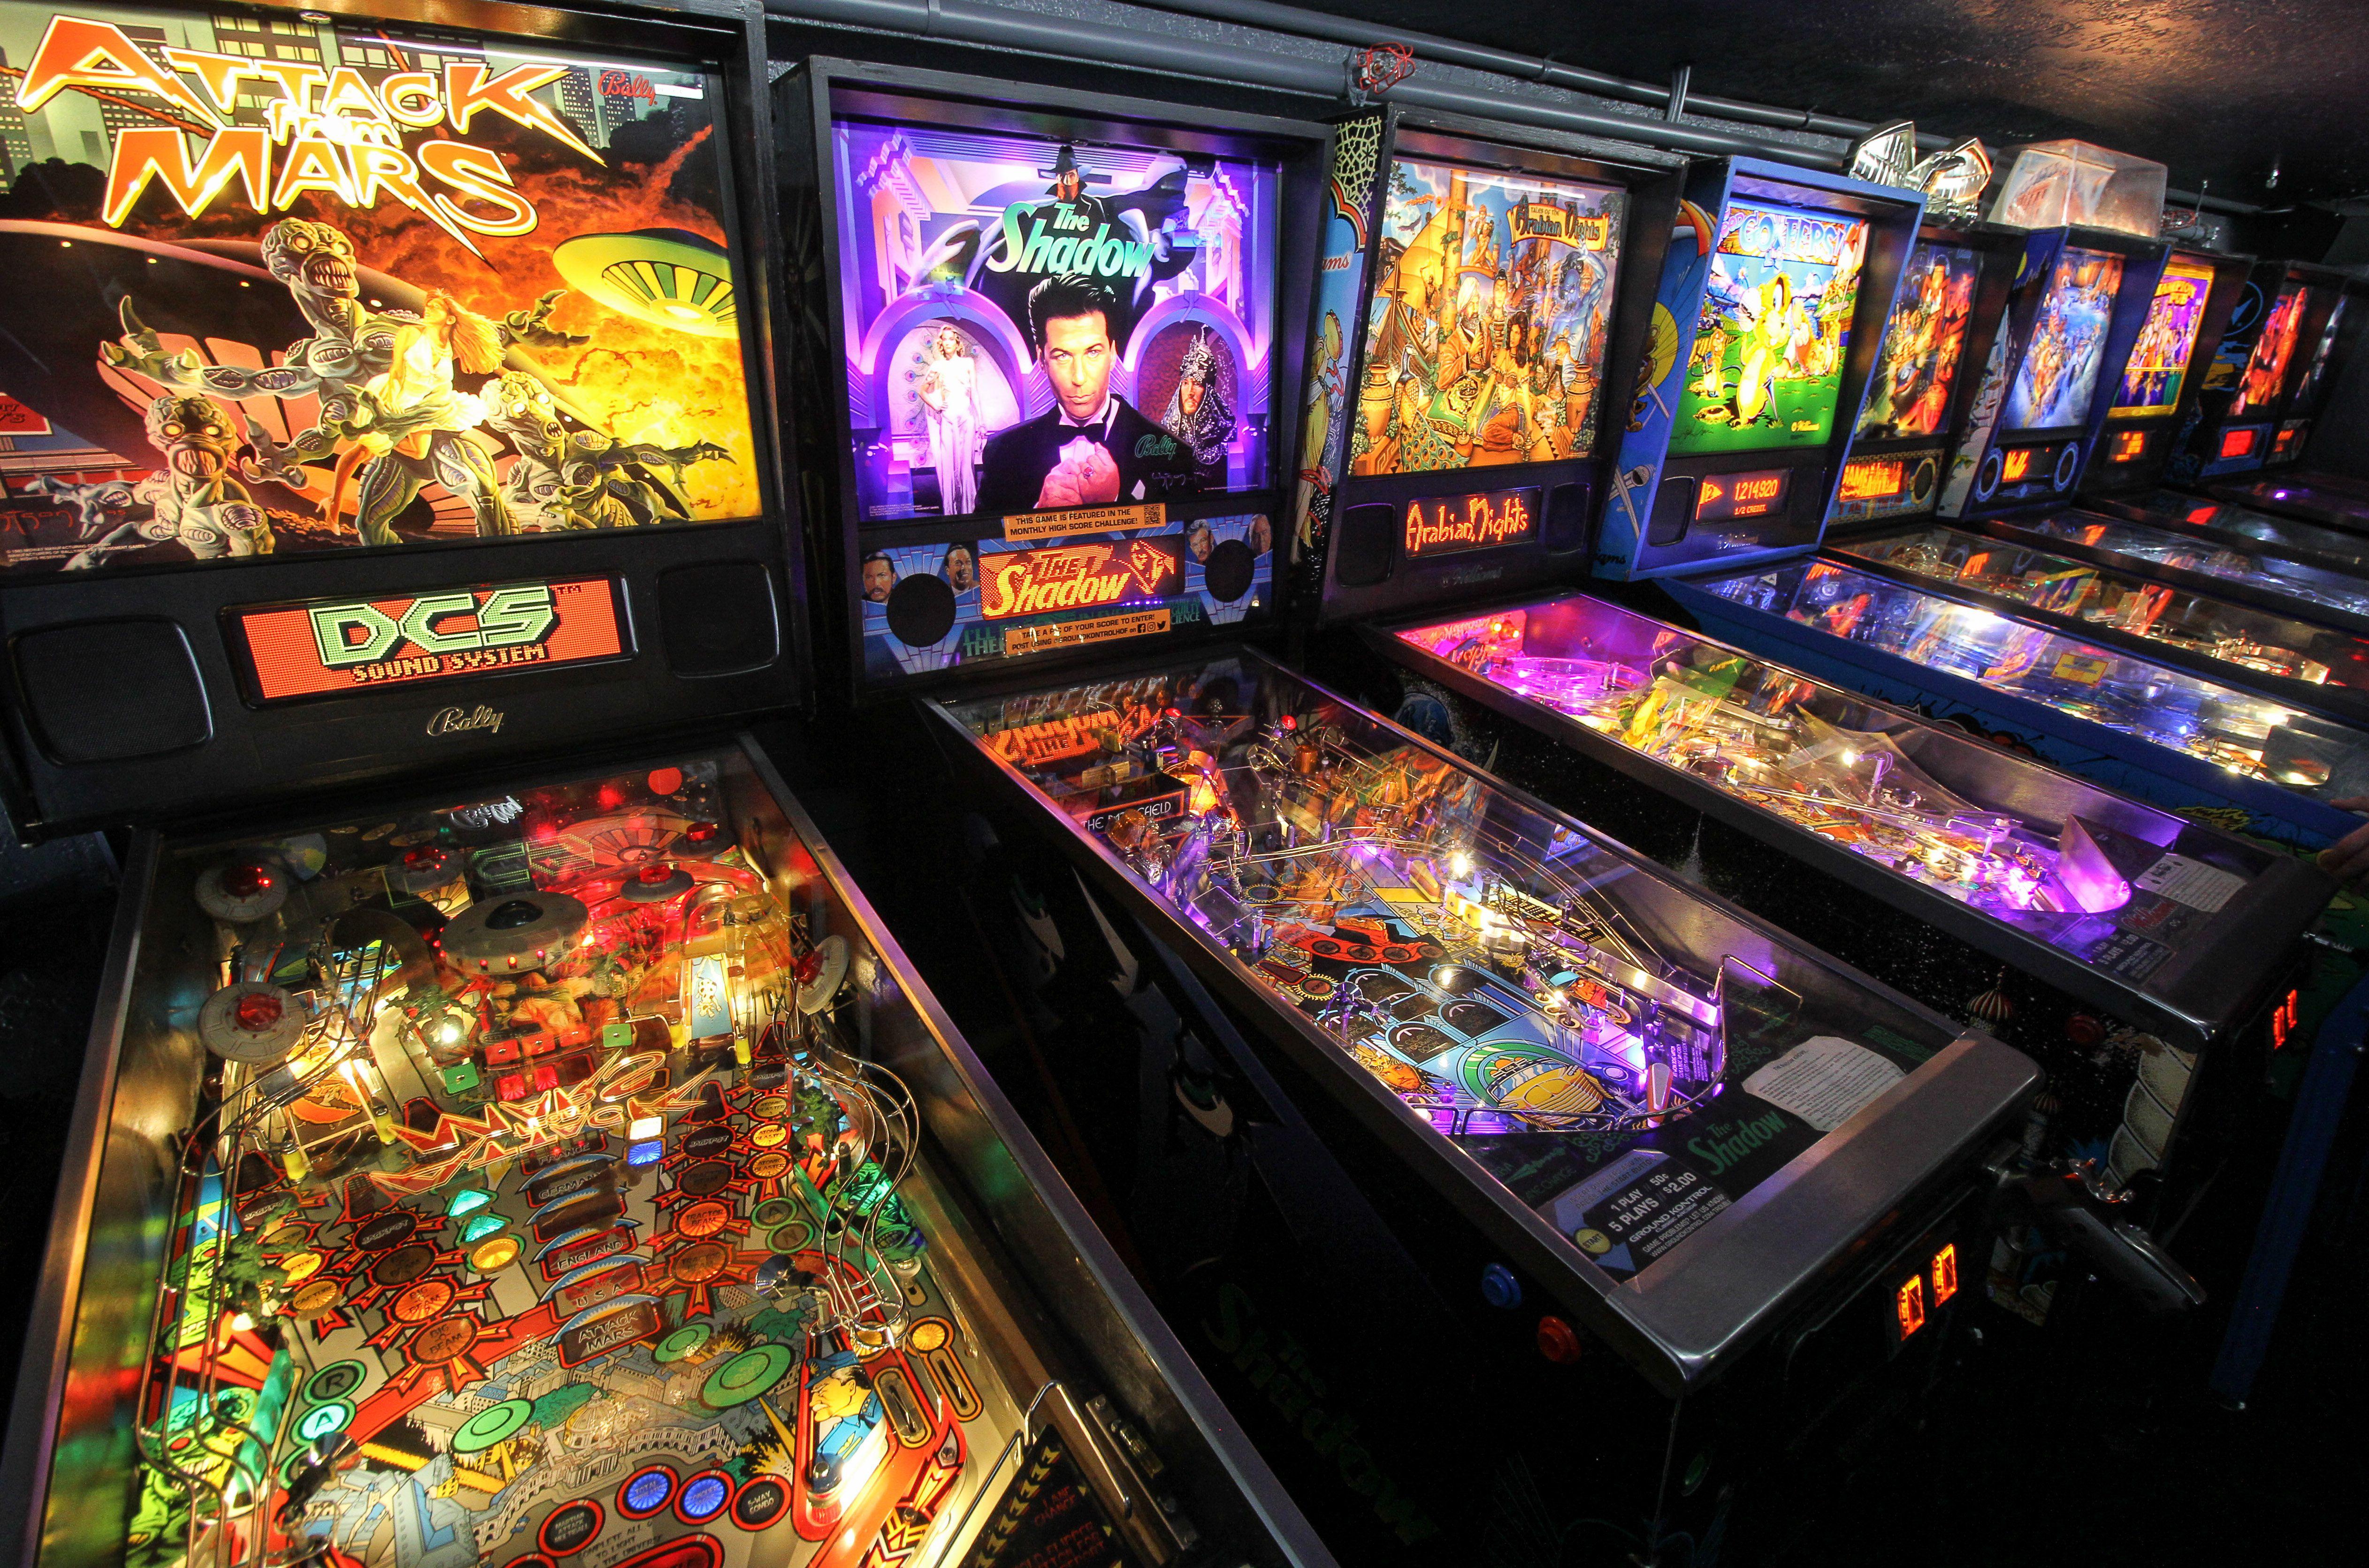 Pinball machines at Ground Kontrol